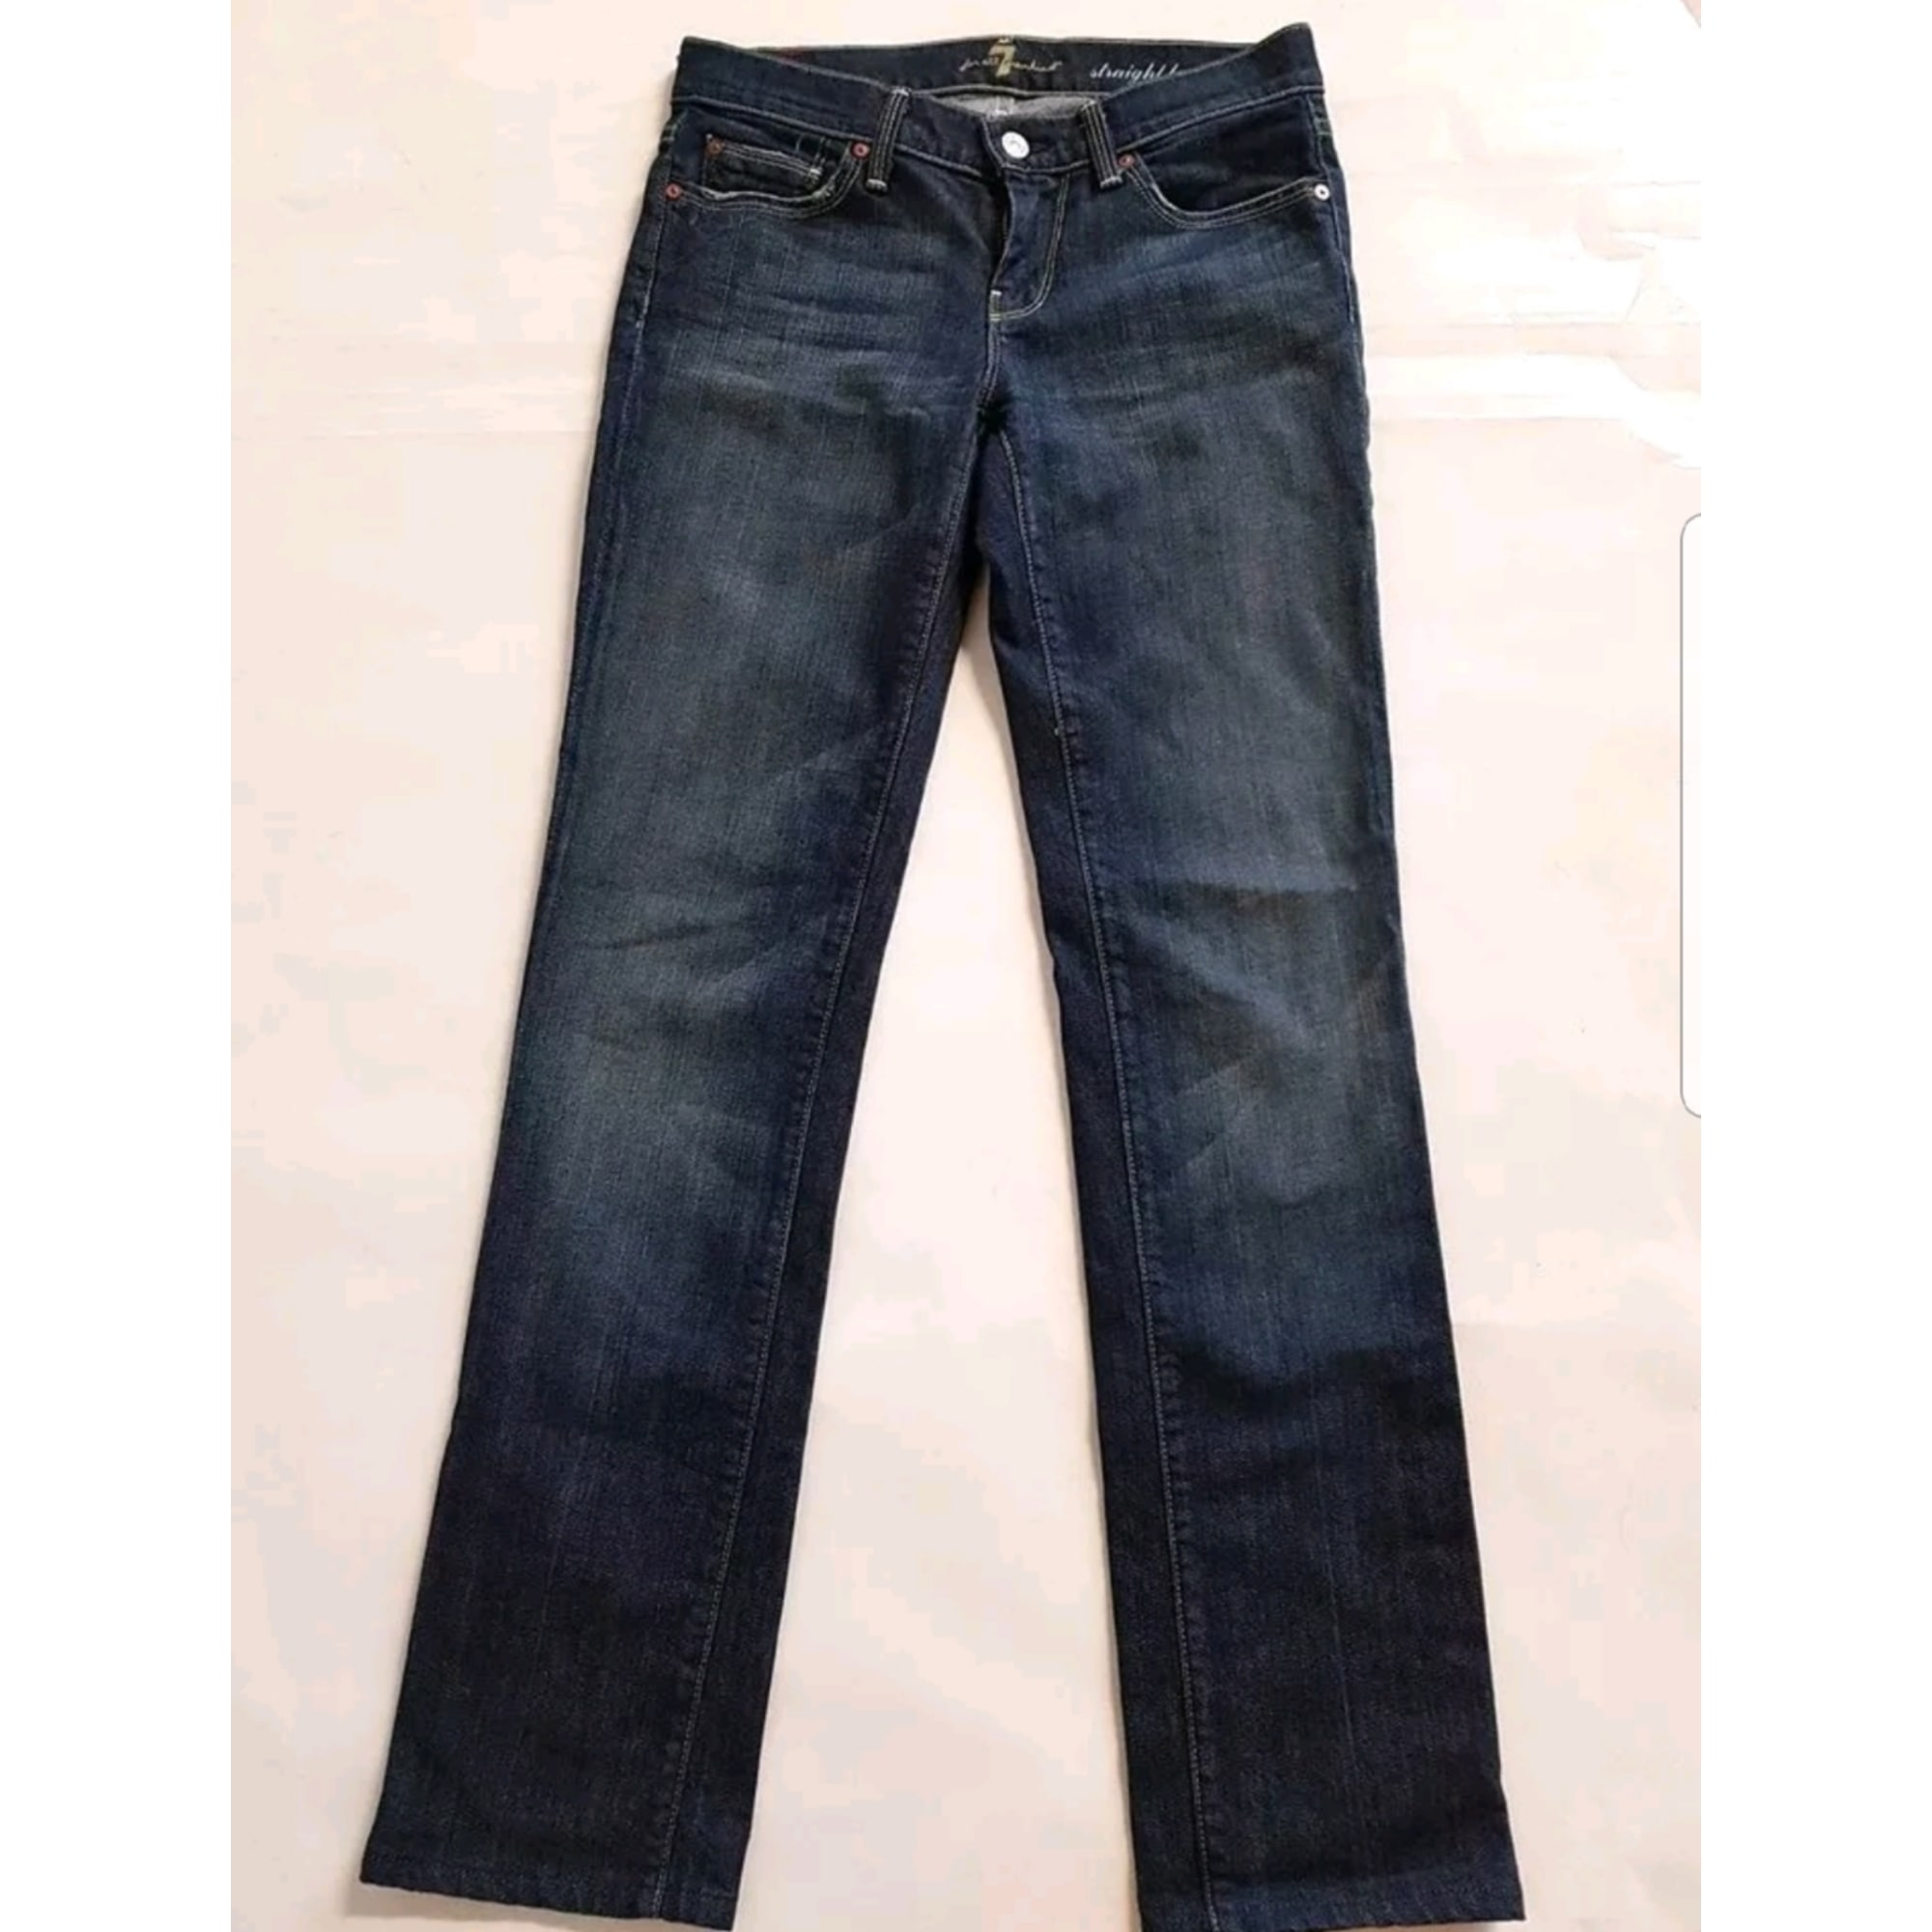 Pantalon slim, cigarette 7 FOR ALL MANKIND Bleu, bleu marine, bleu turquoise